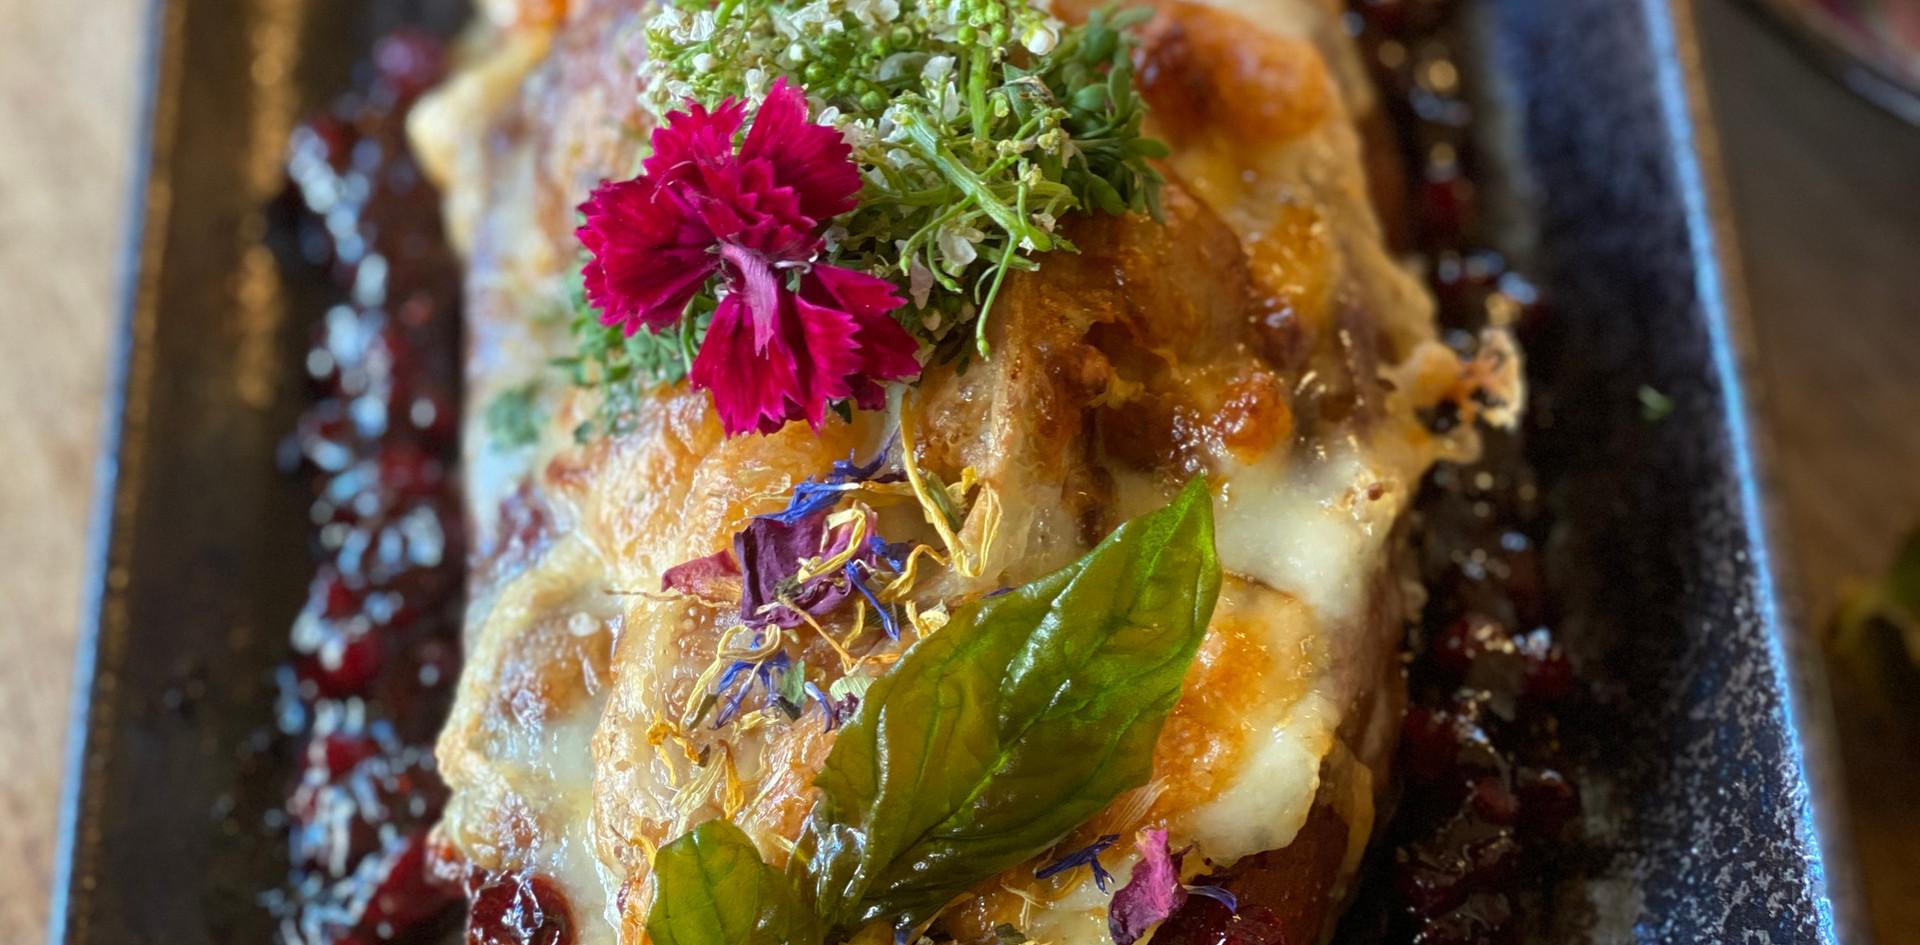 Stulle Frühstücks-Manufaktur - Hotel Wegner - The culinary Art Hotel